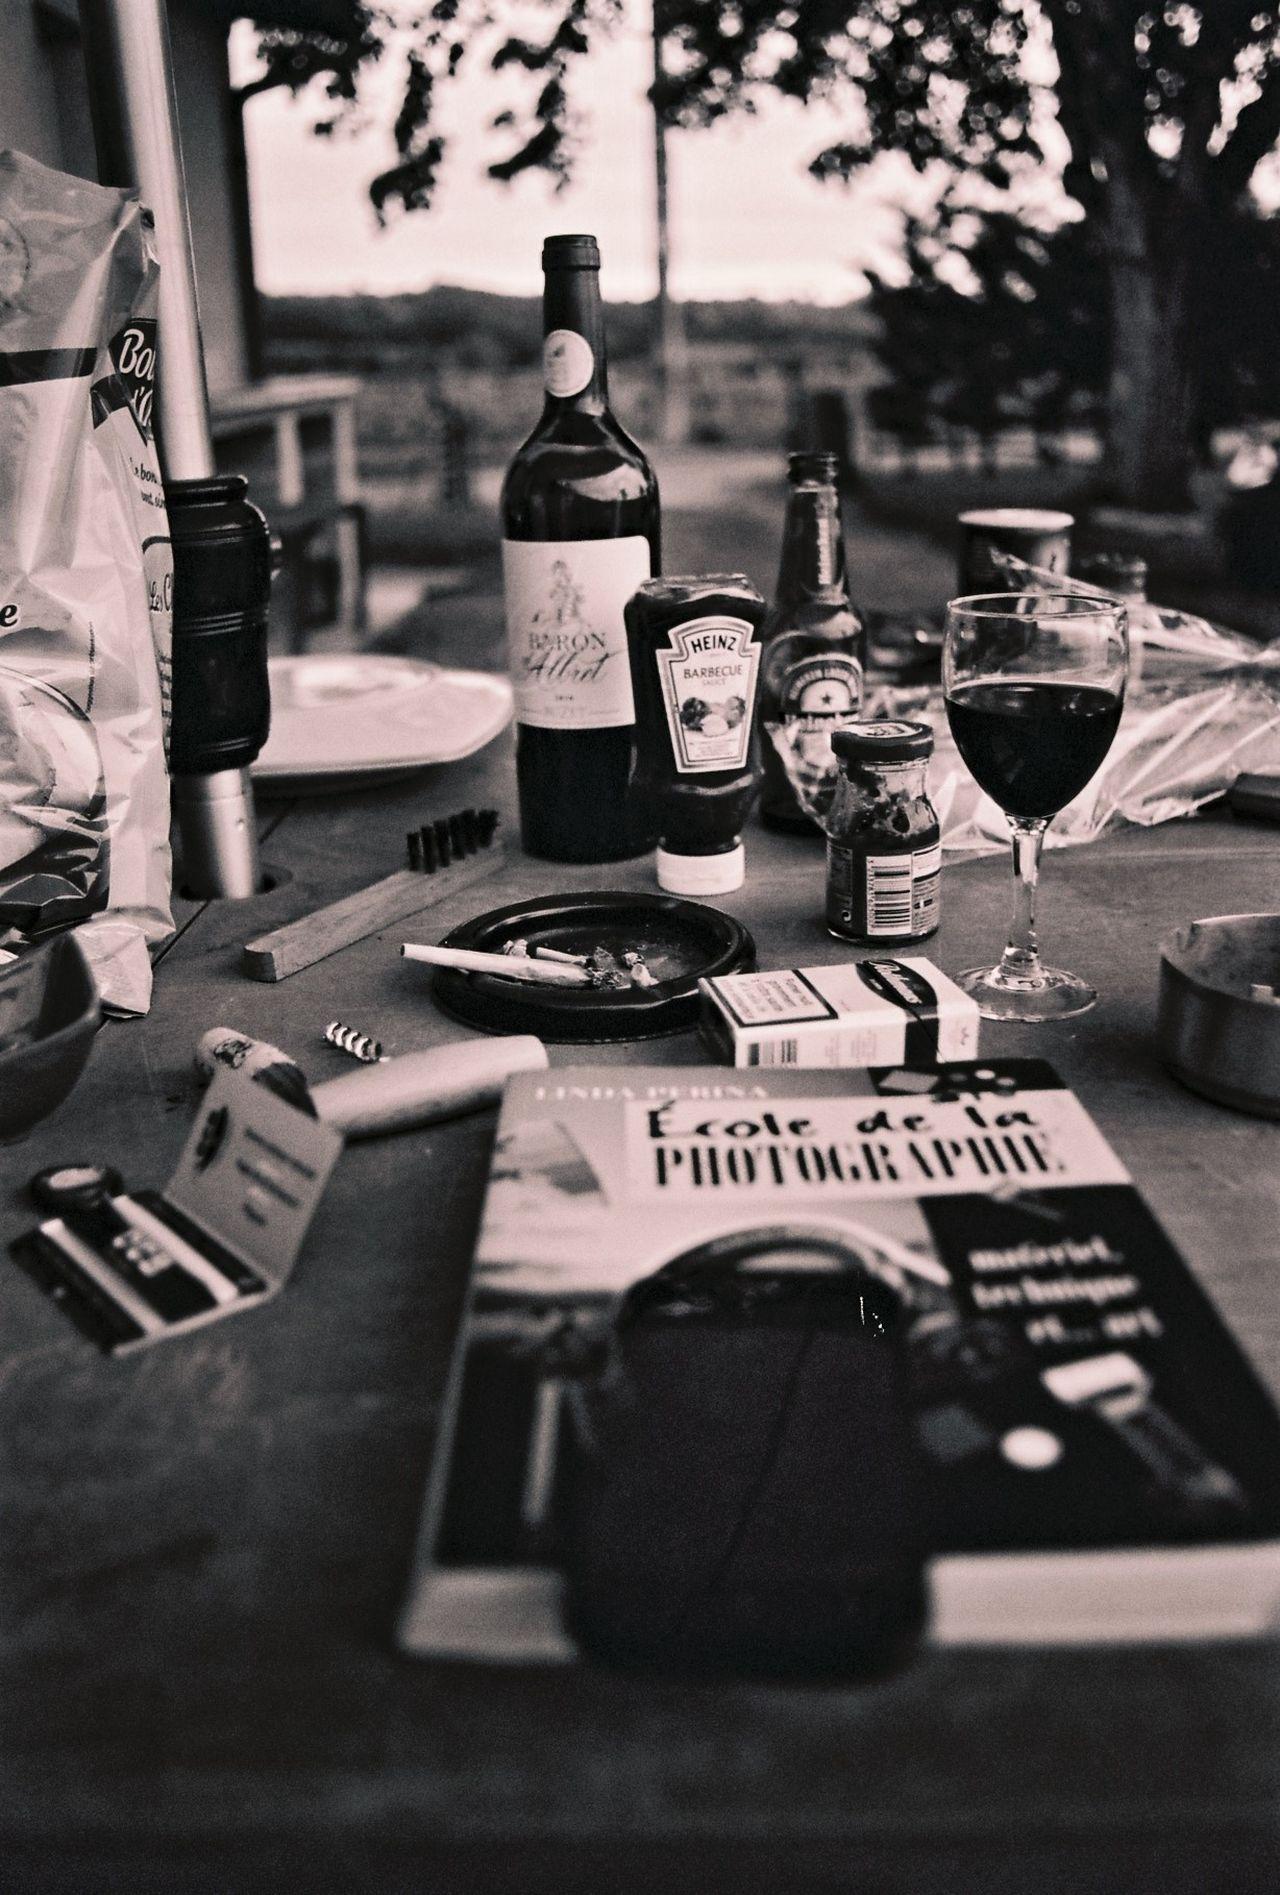 35mm Film Analogue Photography Archival Blackandwhite Bottle Chilling Drink EyeEm Best Shots Film Film Photography Filmisnotdead Food Food And Drink Ishootfilm Noir Et Blanc Table Tables